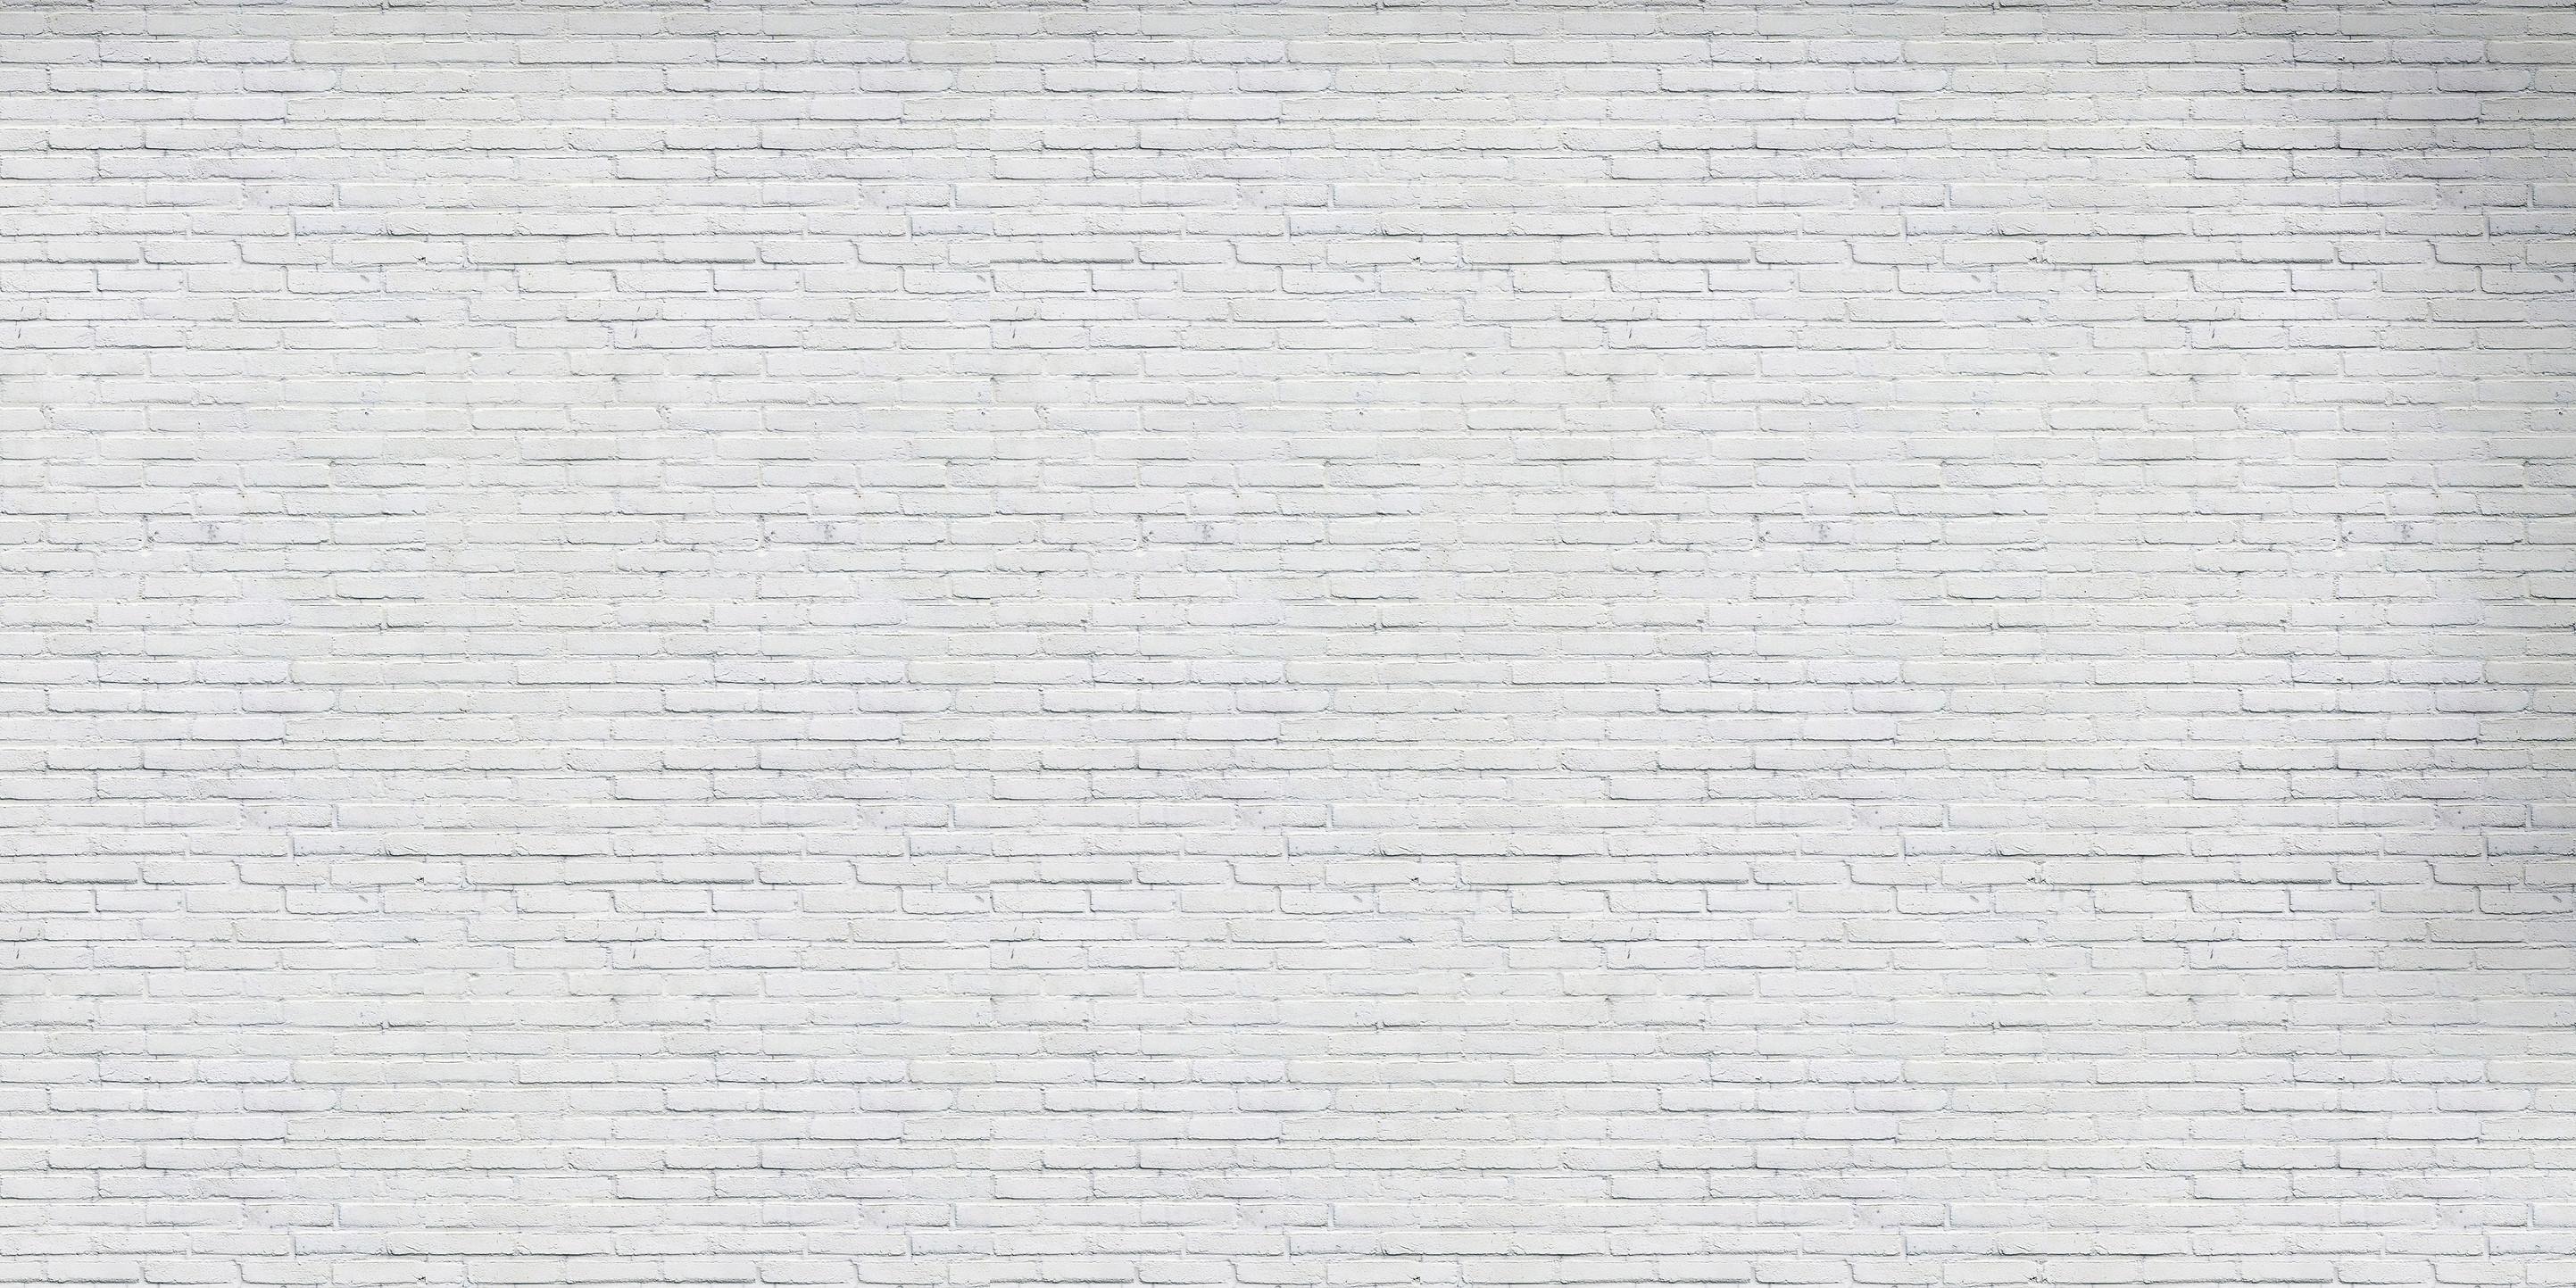 White Brick Wall copy.jpg